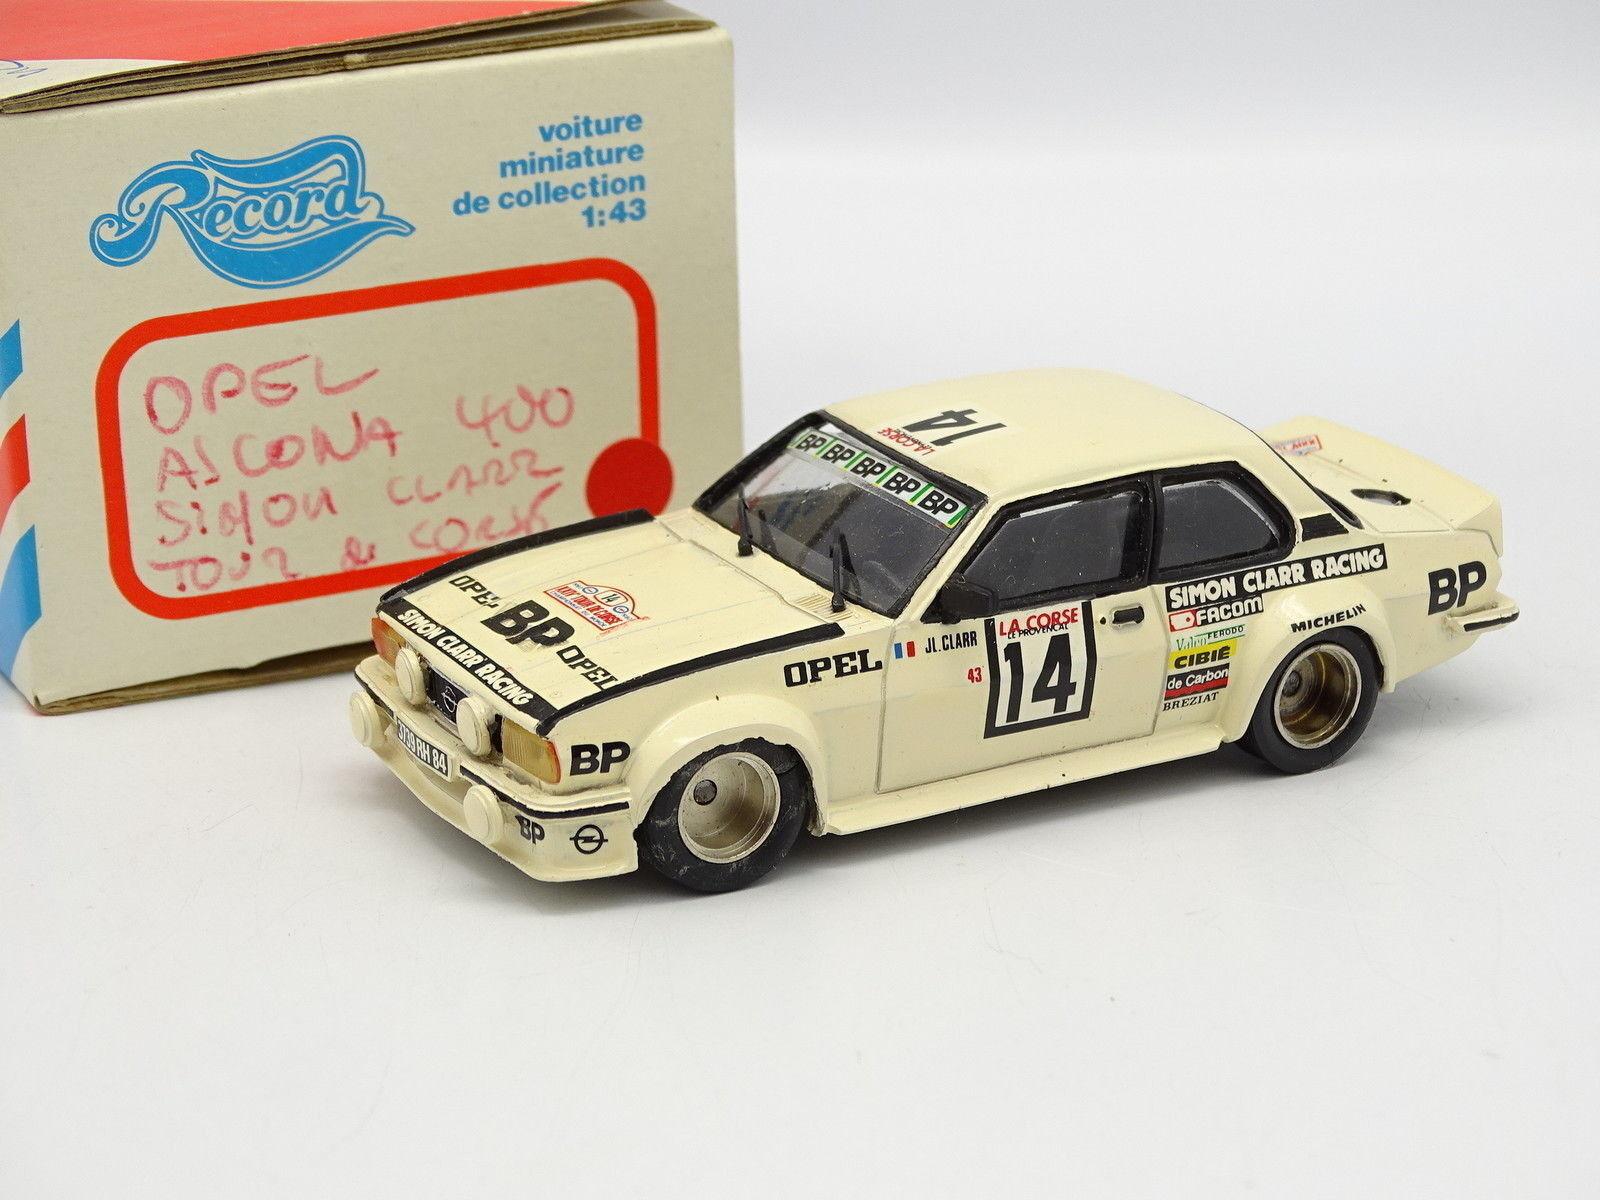 Record Kit Assembled Resin 1 43 - Opel Ascona 400 Tour of Corse 1980